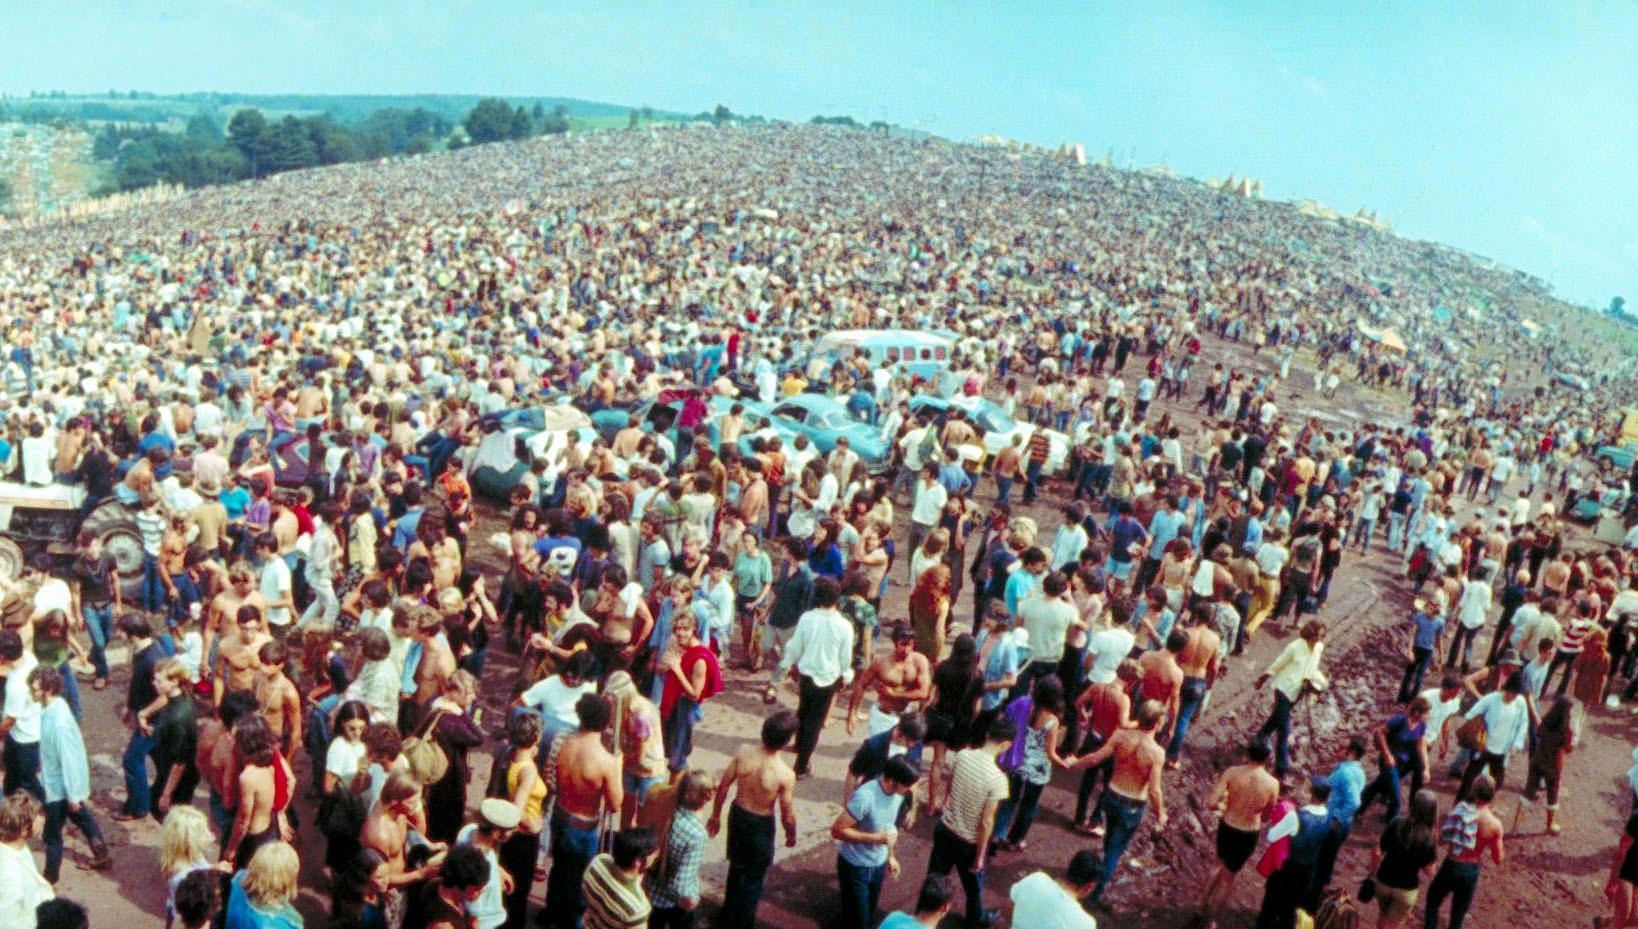 Wide-angle overall of huge crowd facing